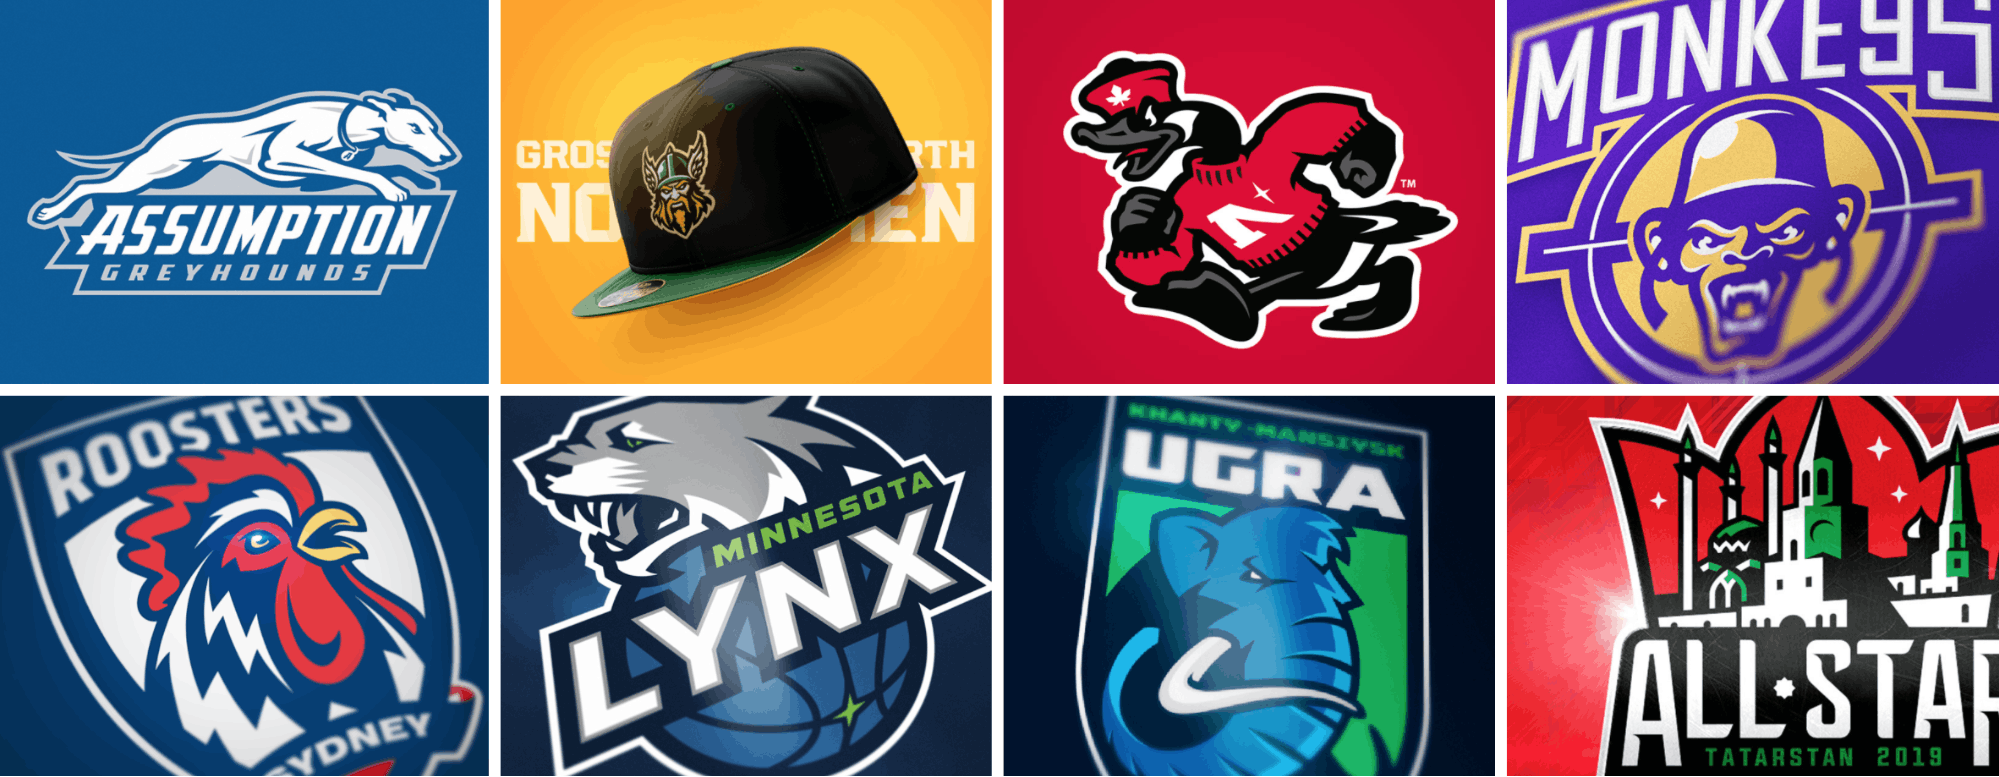 sport logos mood board examples